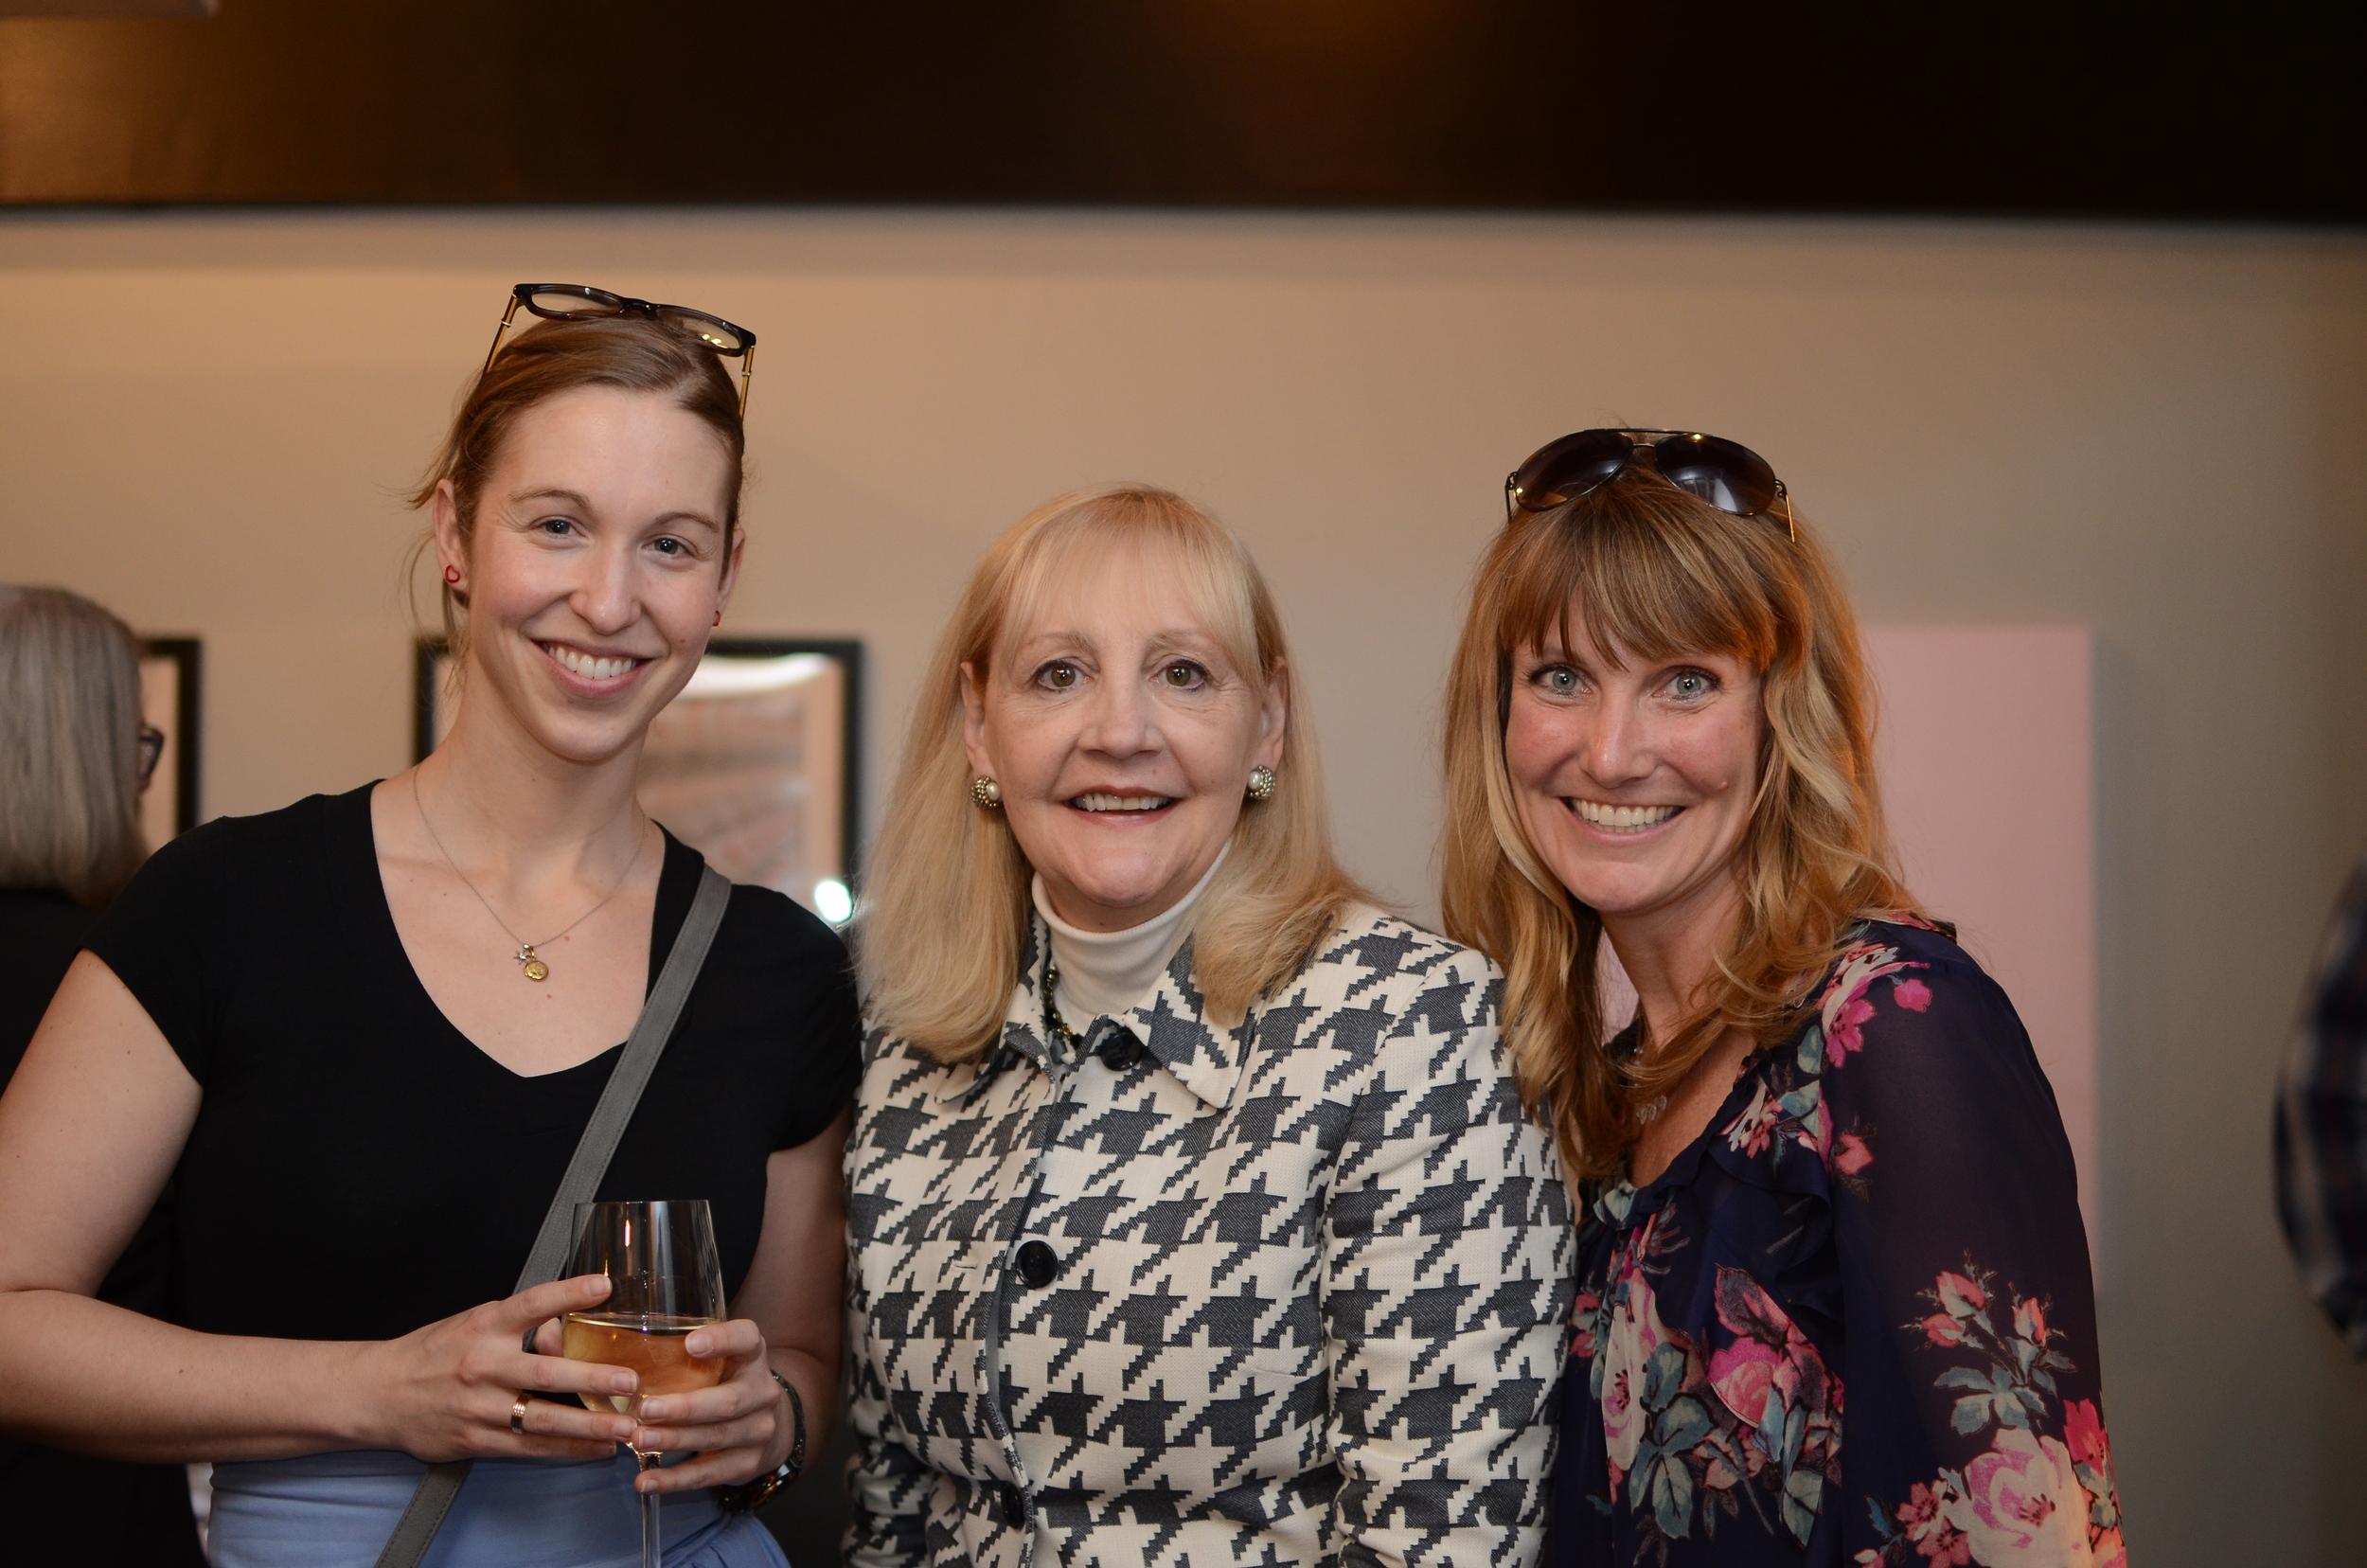 Kristin Nelson, Kansas City Public Library; Elizabeth Usovicz, WhiteSpace Consulting; Diane Marty, Faire Consulting